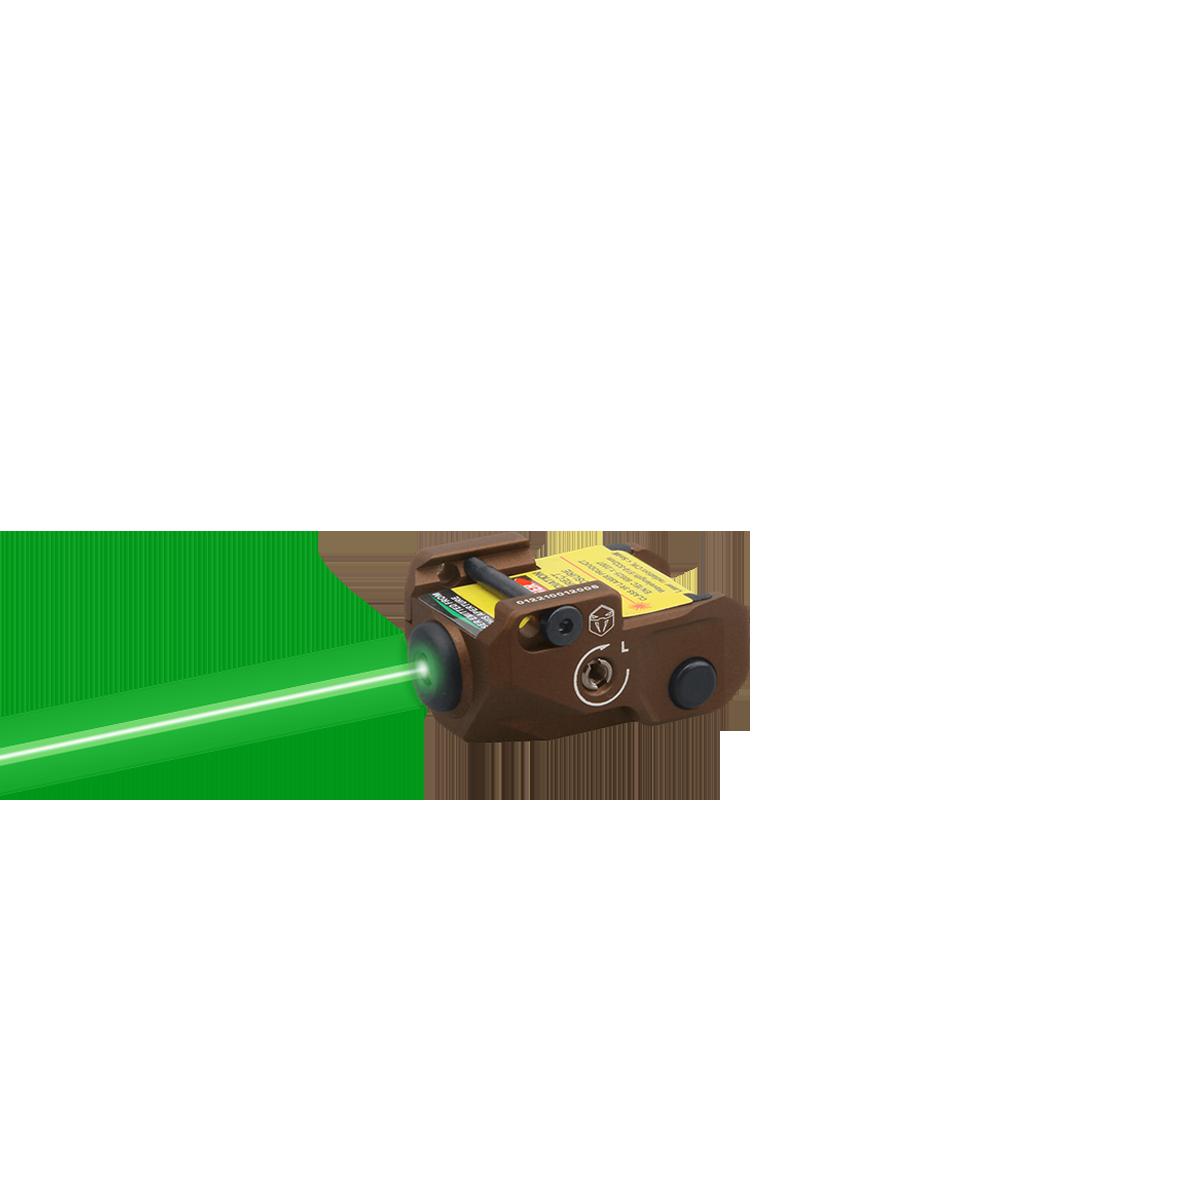 VipeRay Scrapper Subcompact Pistol Green Laser Sight FDE